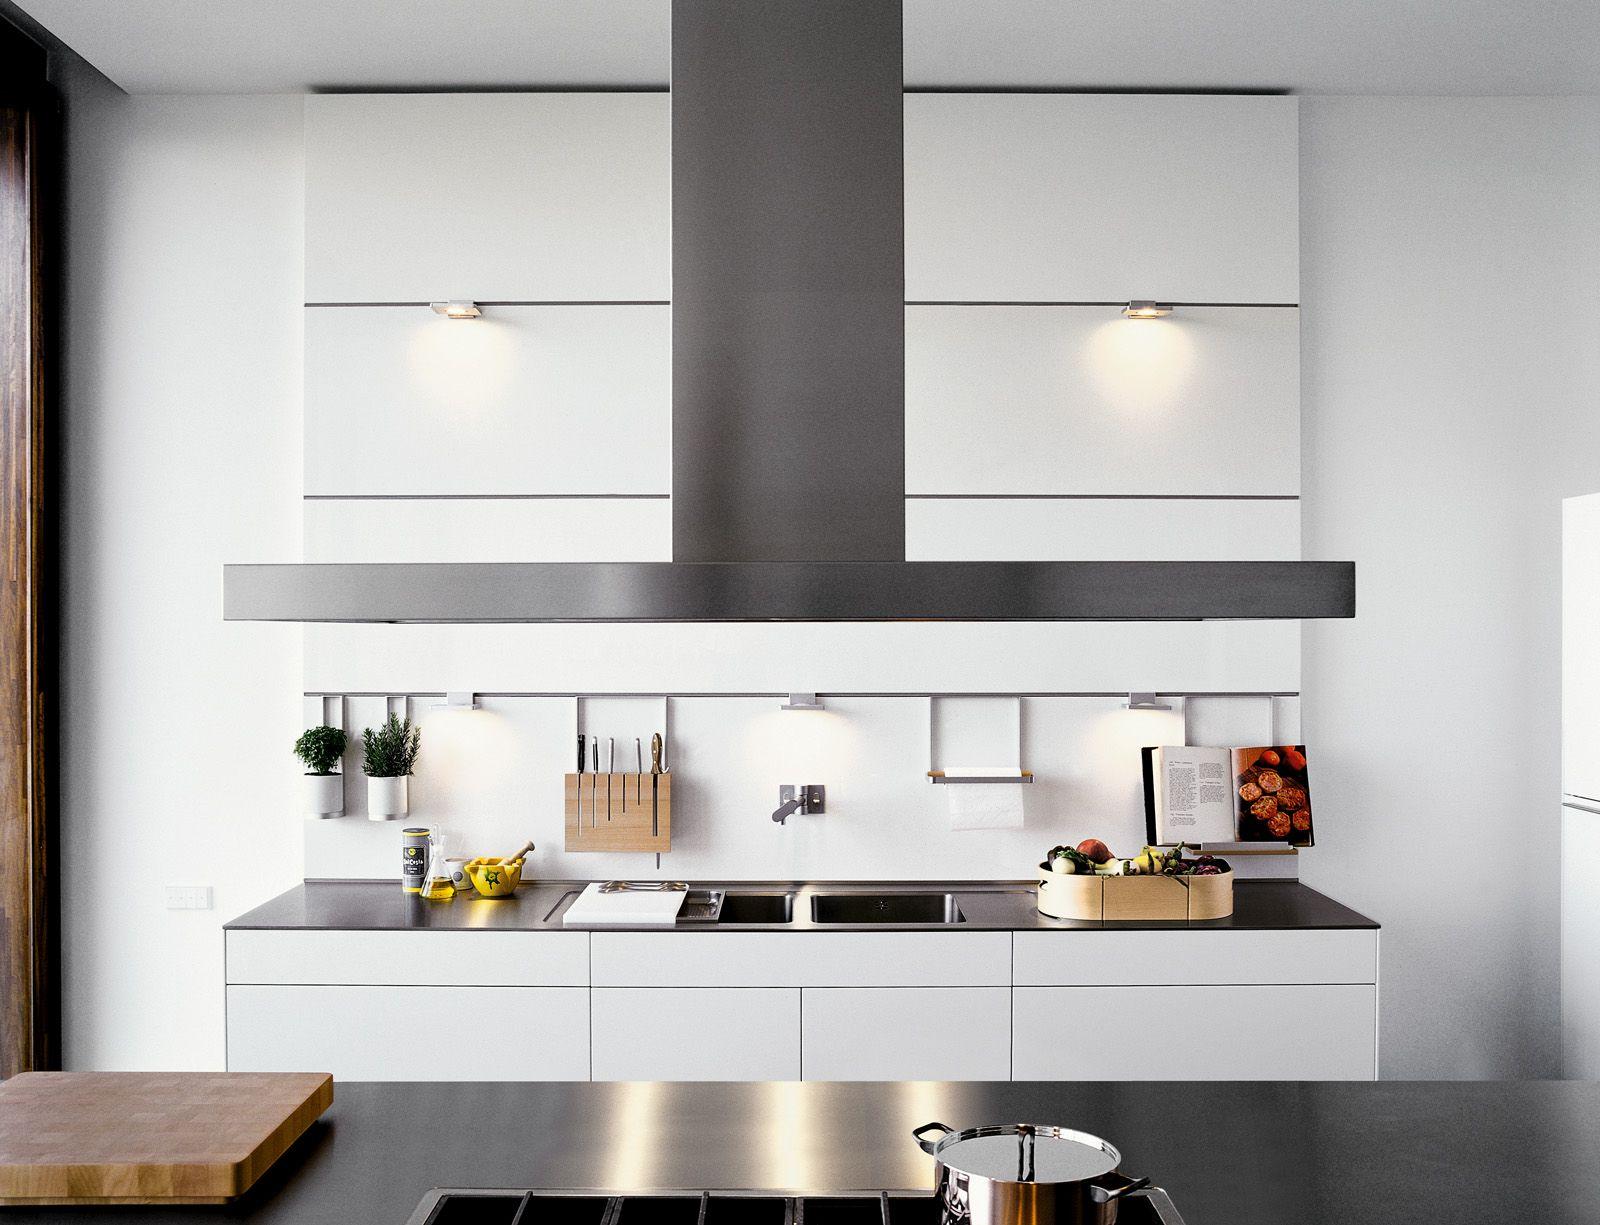 Bulthaup B3 Keuken : Bulthaup rvs keuken keukenkasten rvs indrukwekkend rvs keuken